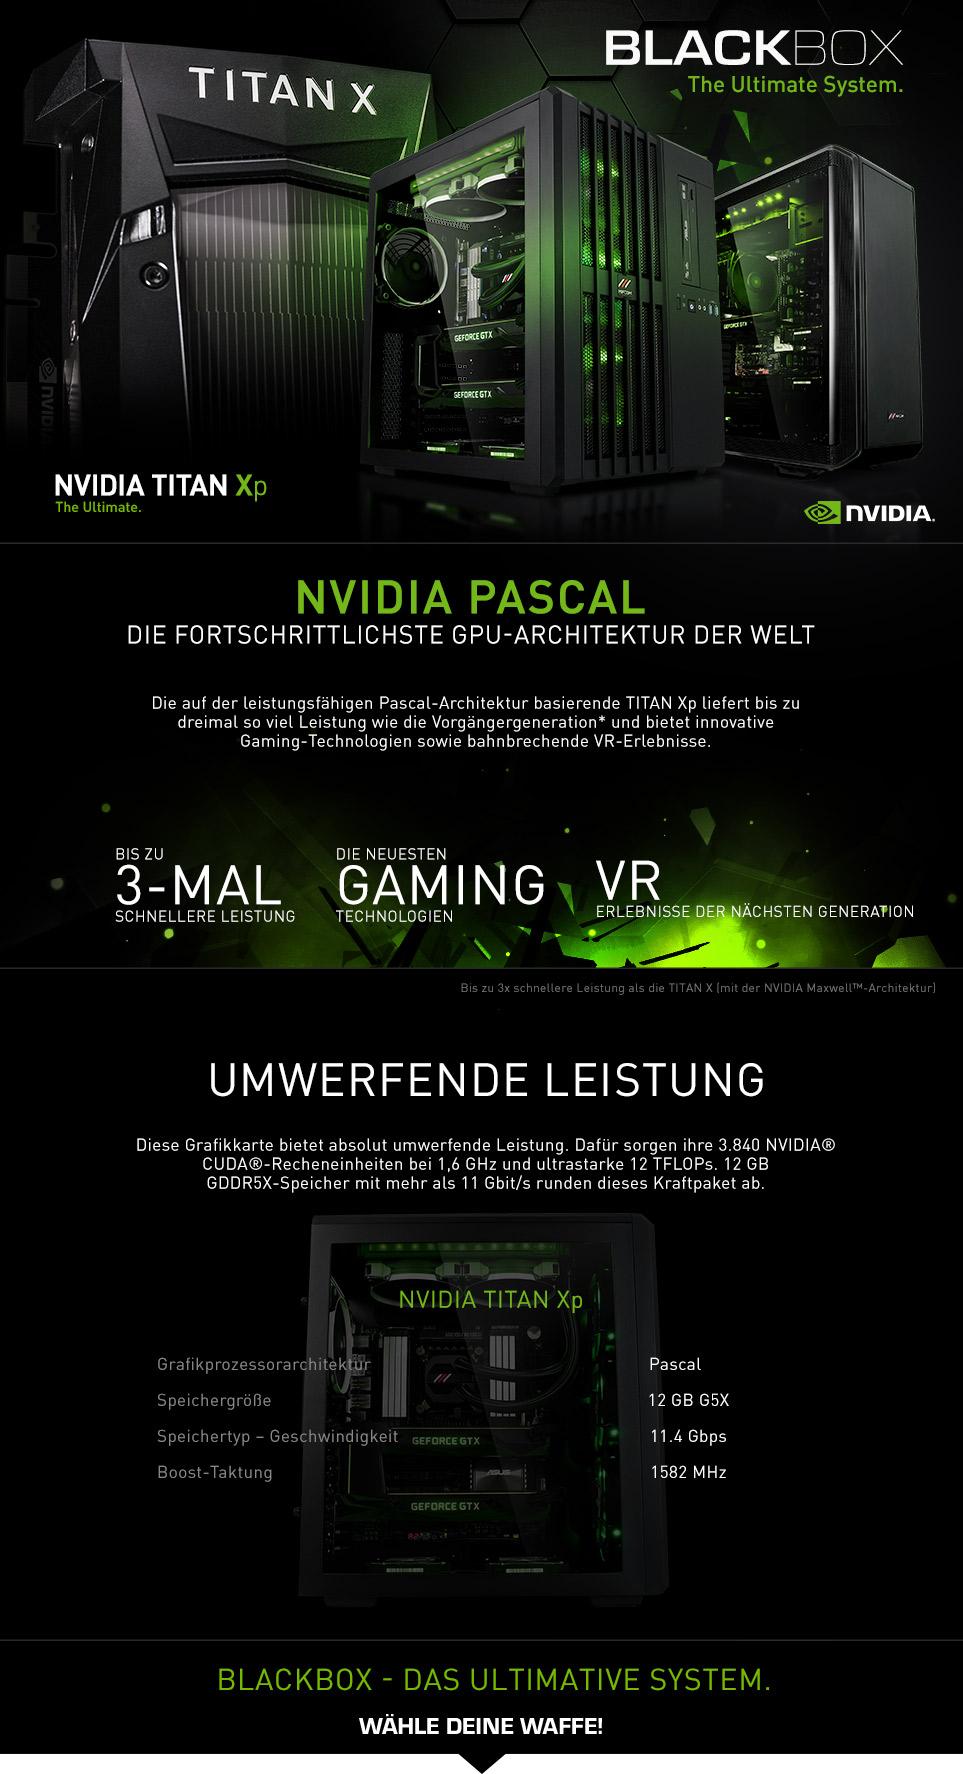 Blackbox High-End Gaming PCs mit NVIDIA TITAN Xp